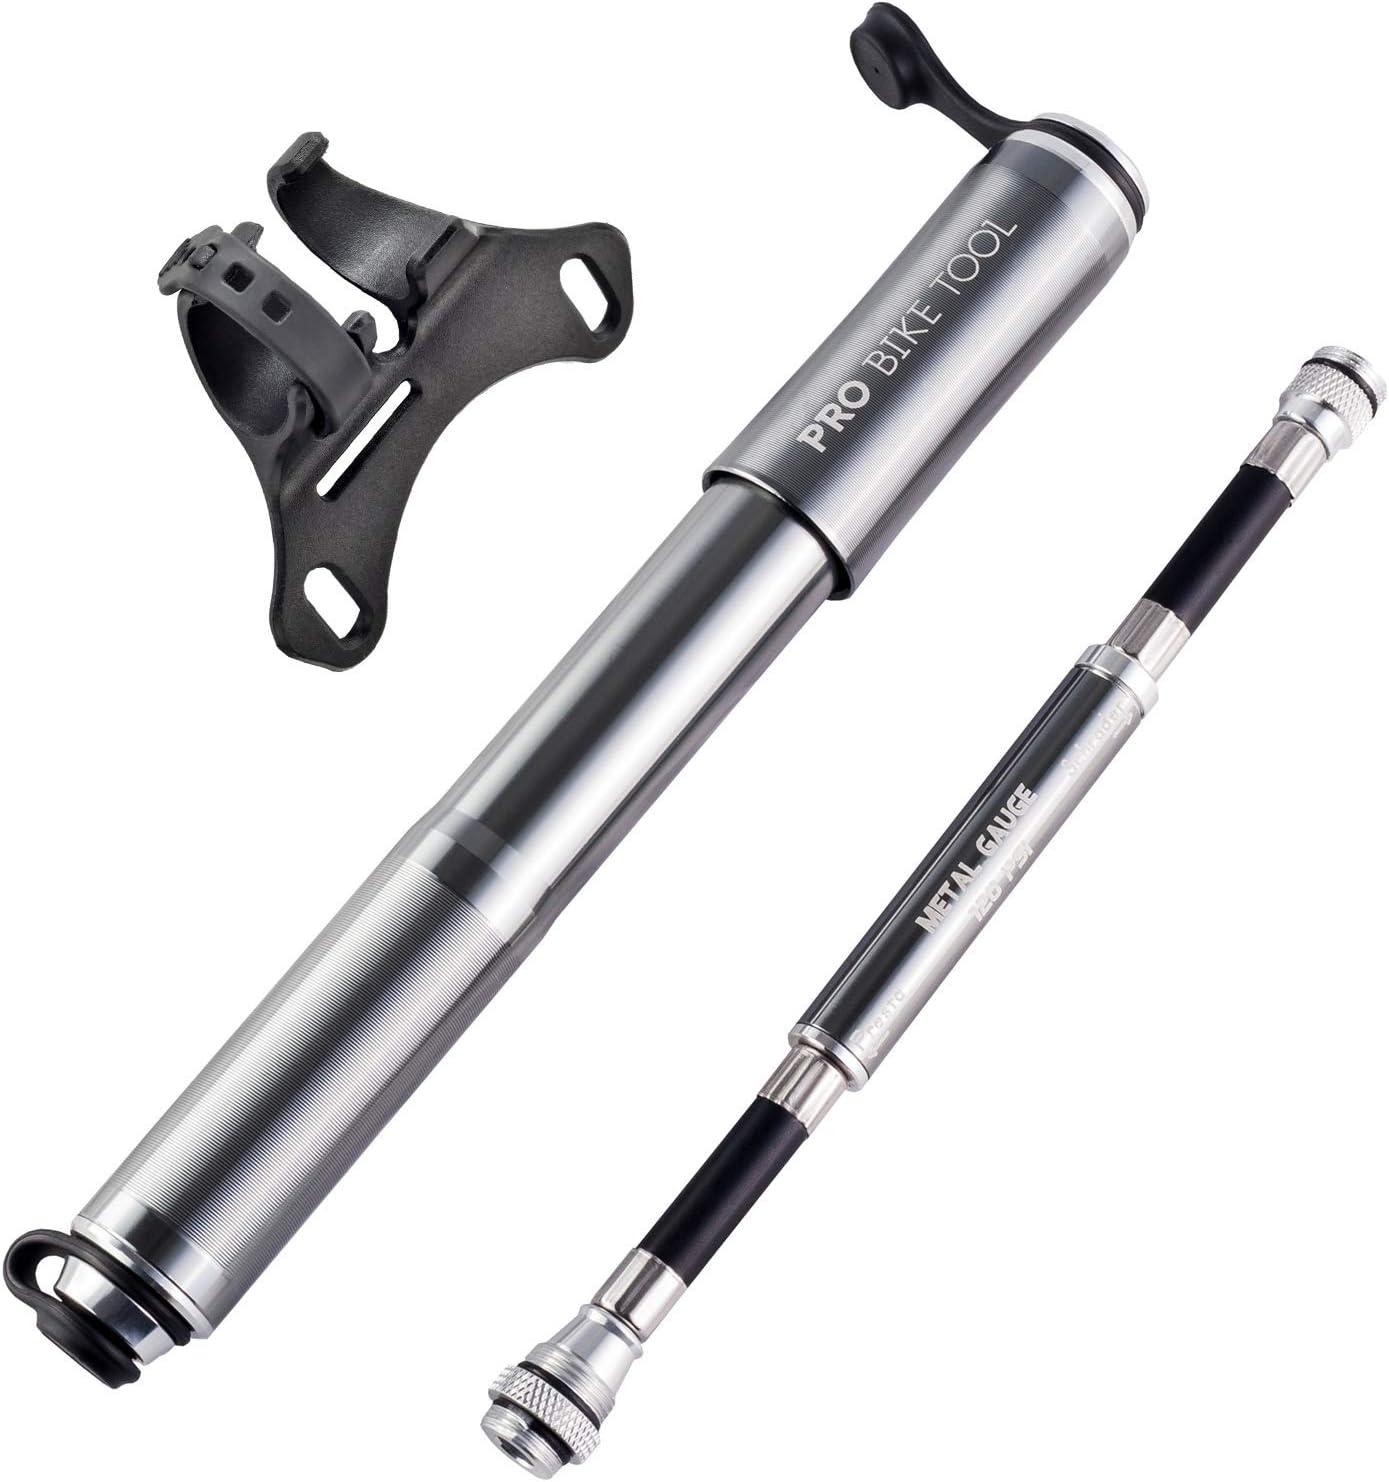 Pro Bike Tool Bike Pump with Gauge